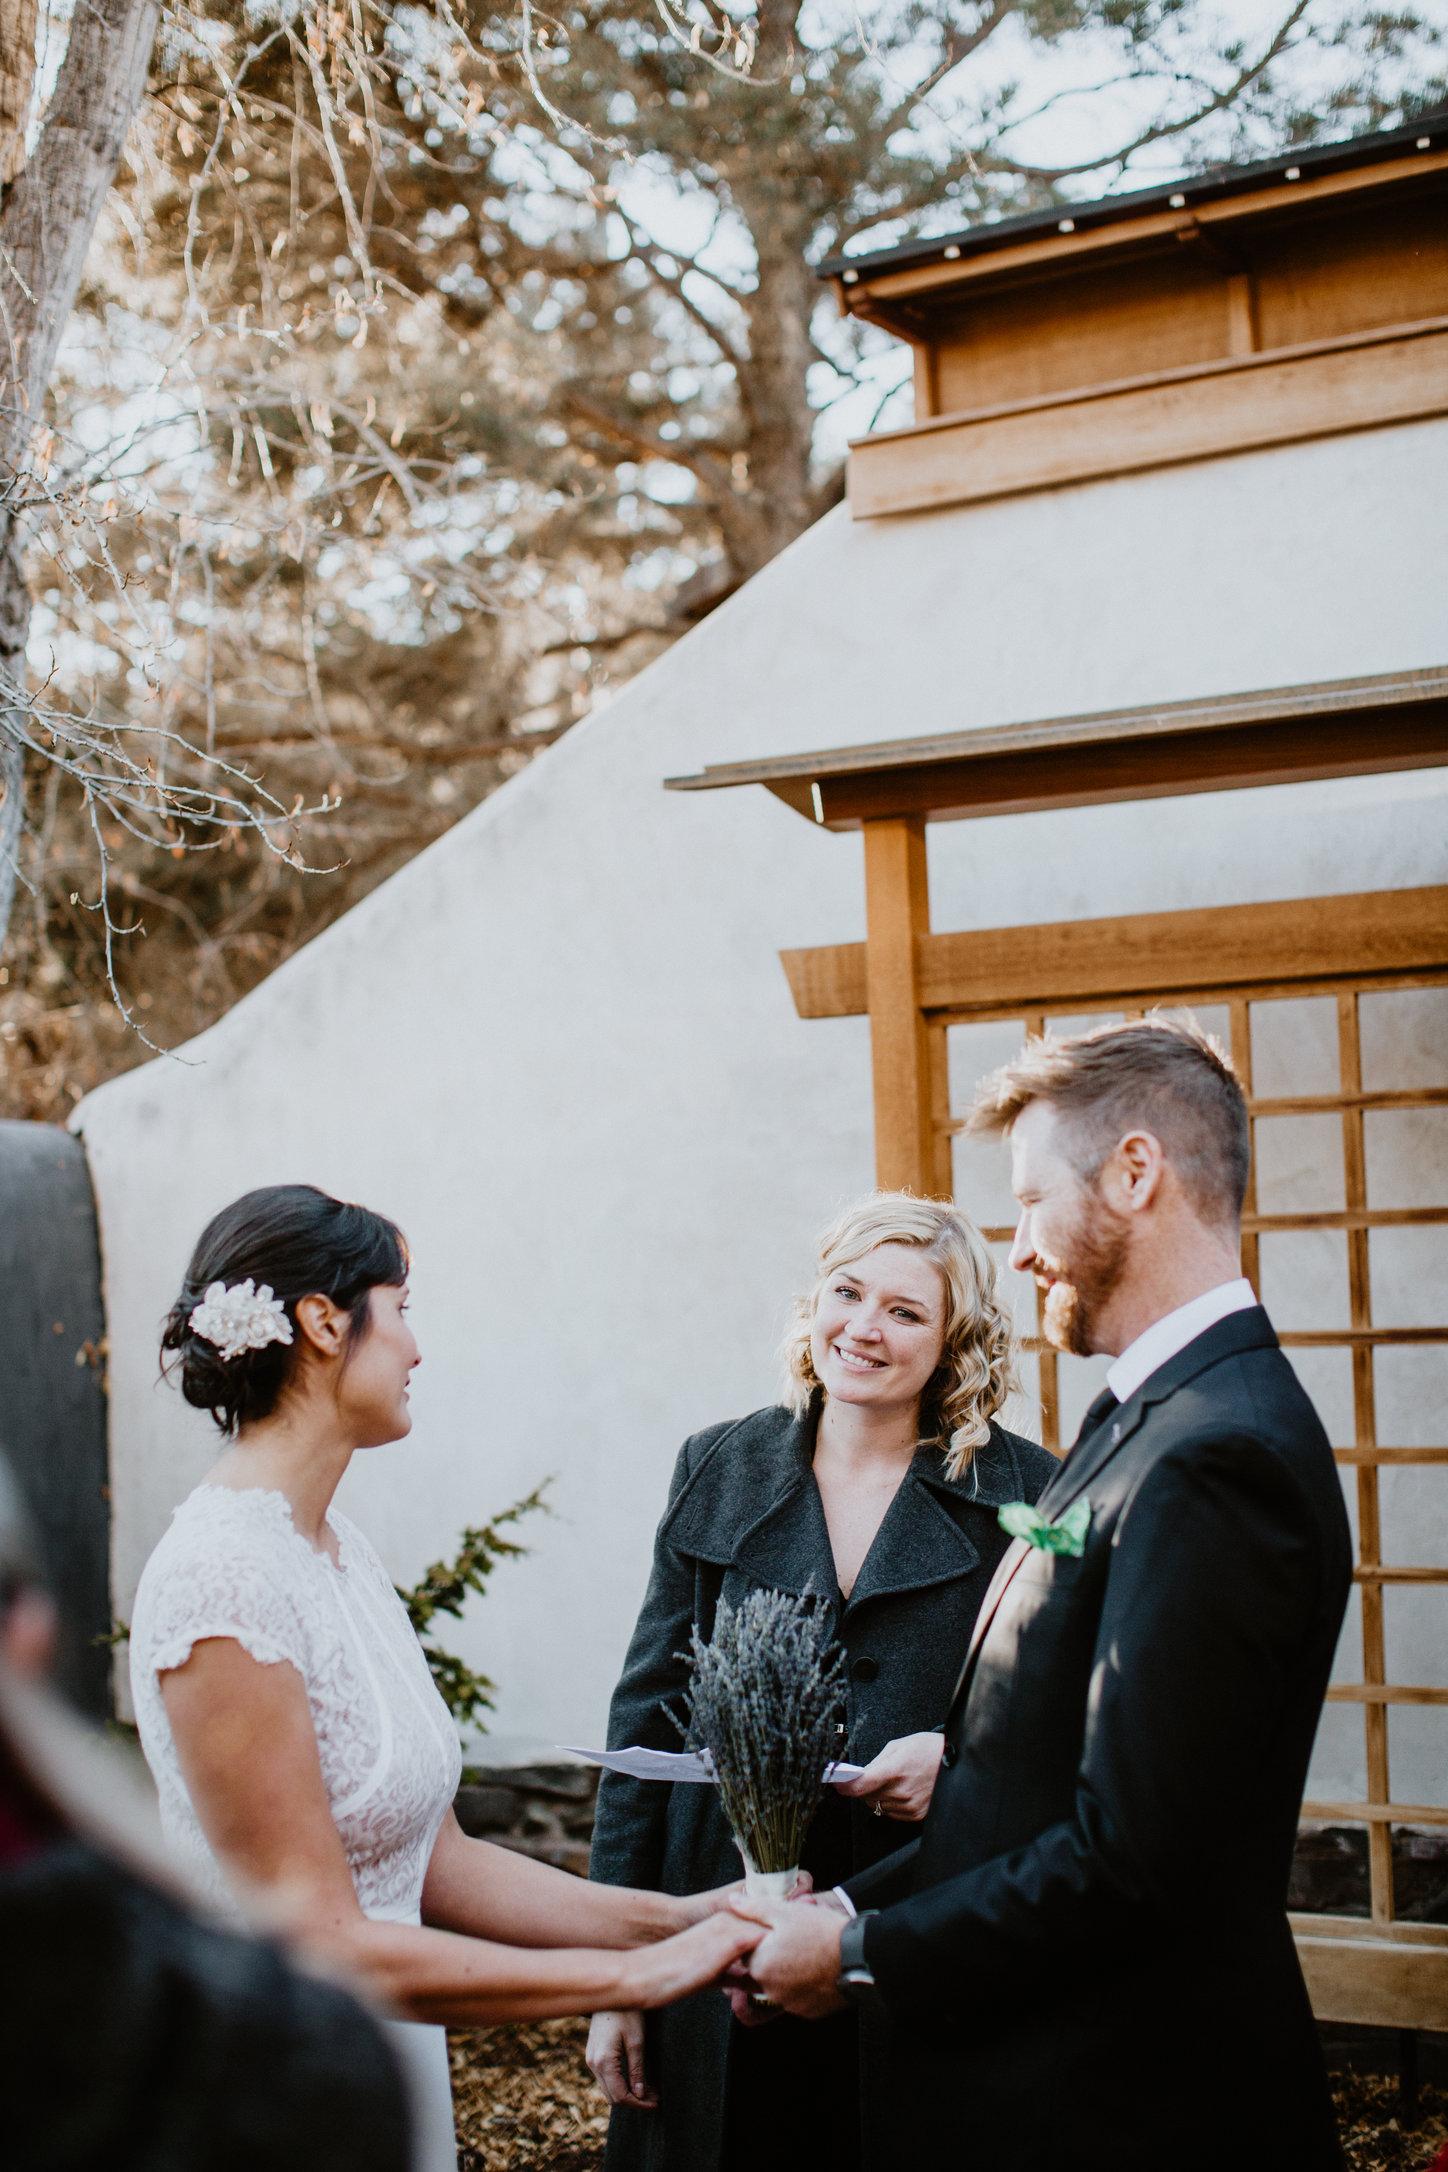 HandM-wedding-74.jpg